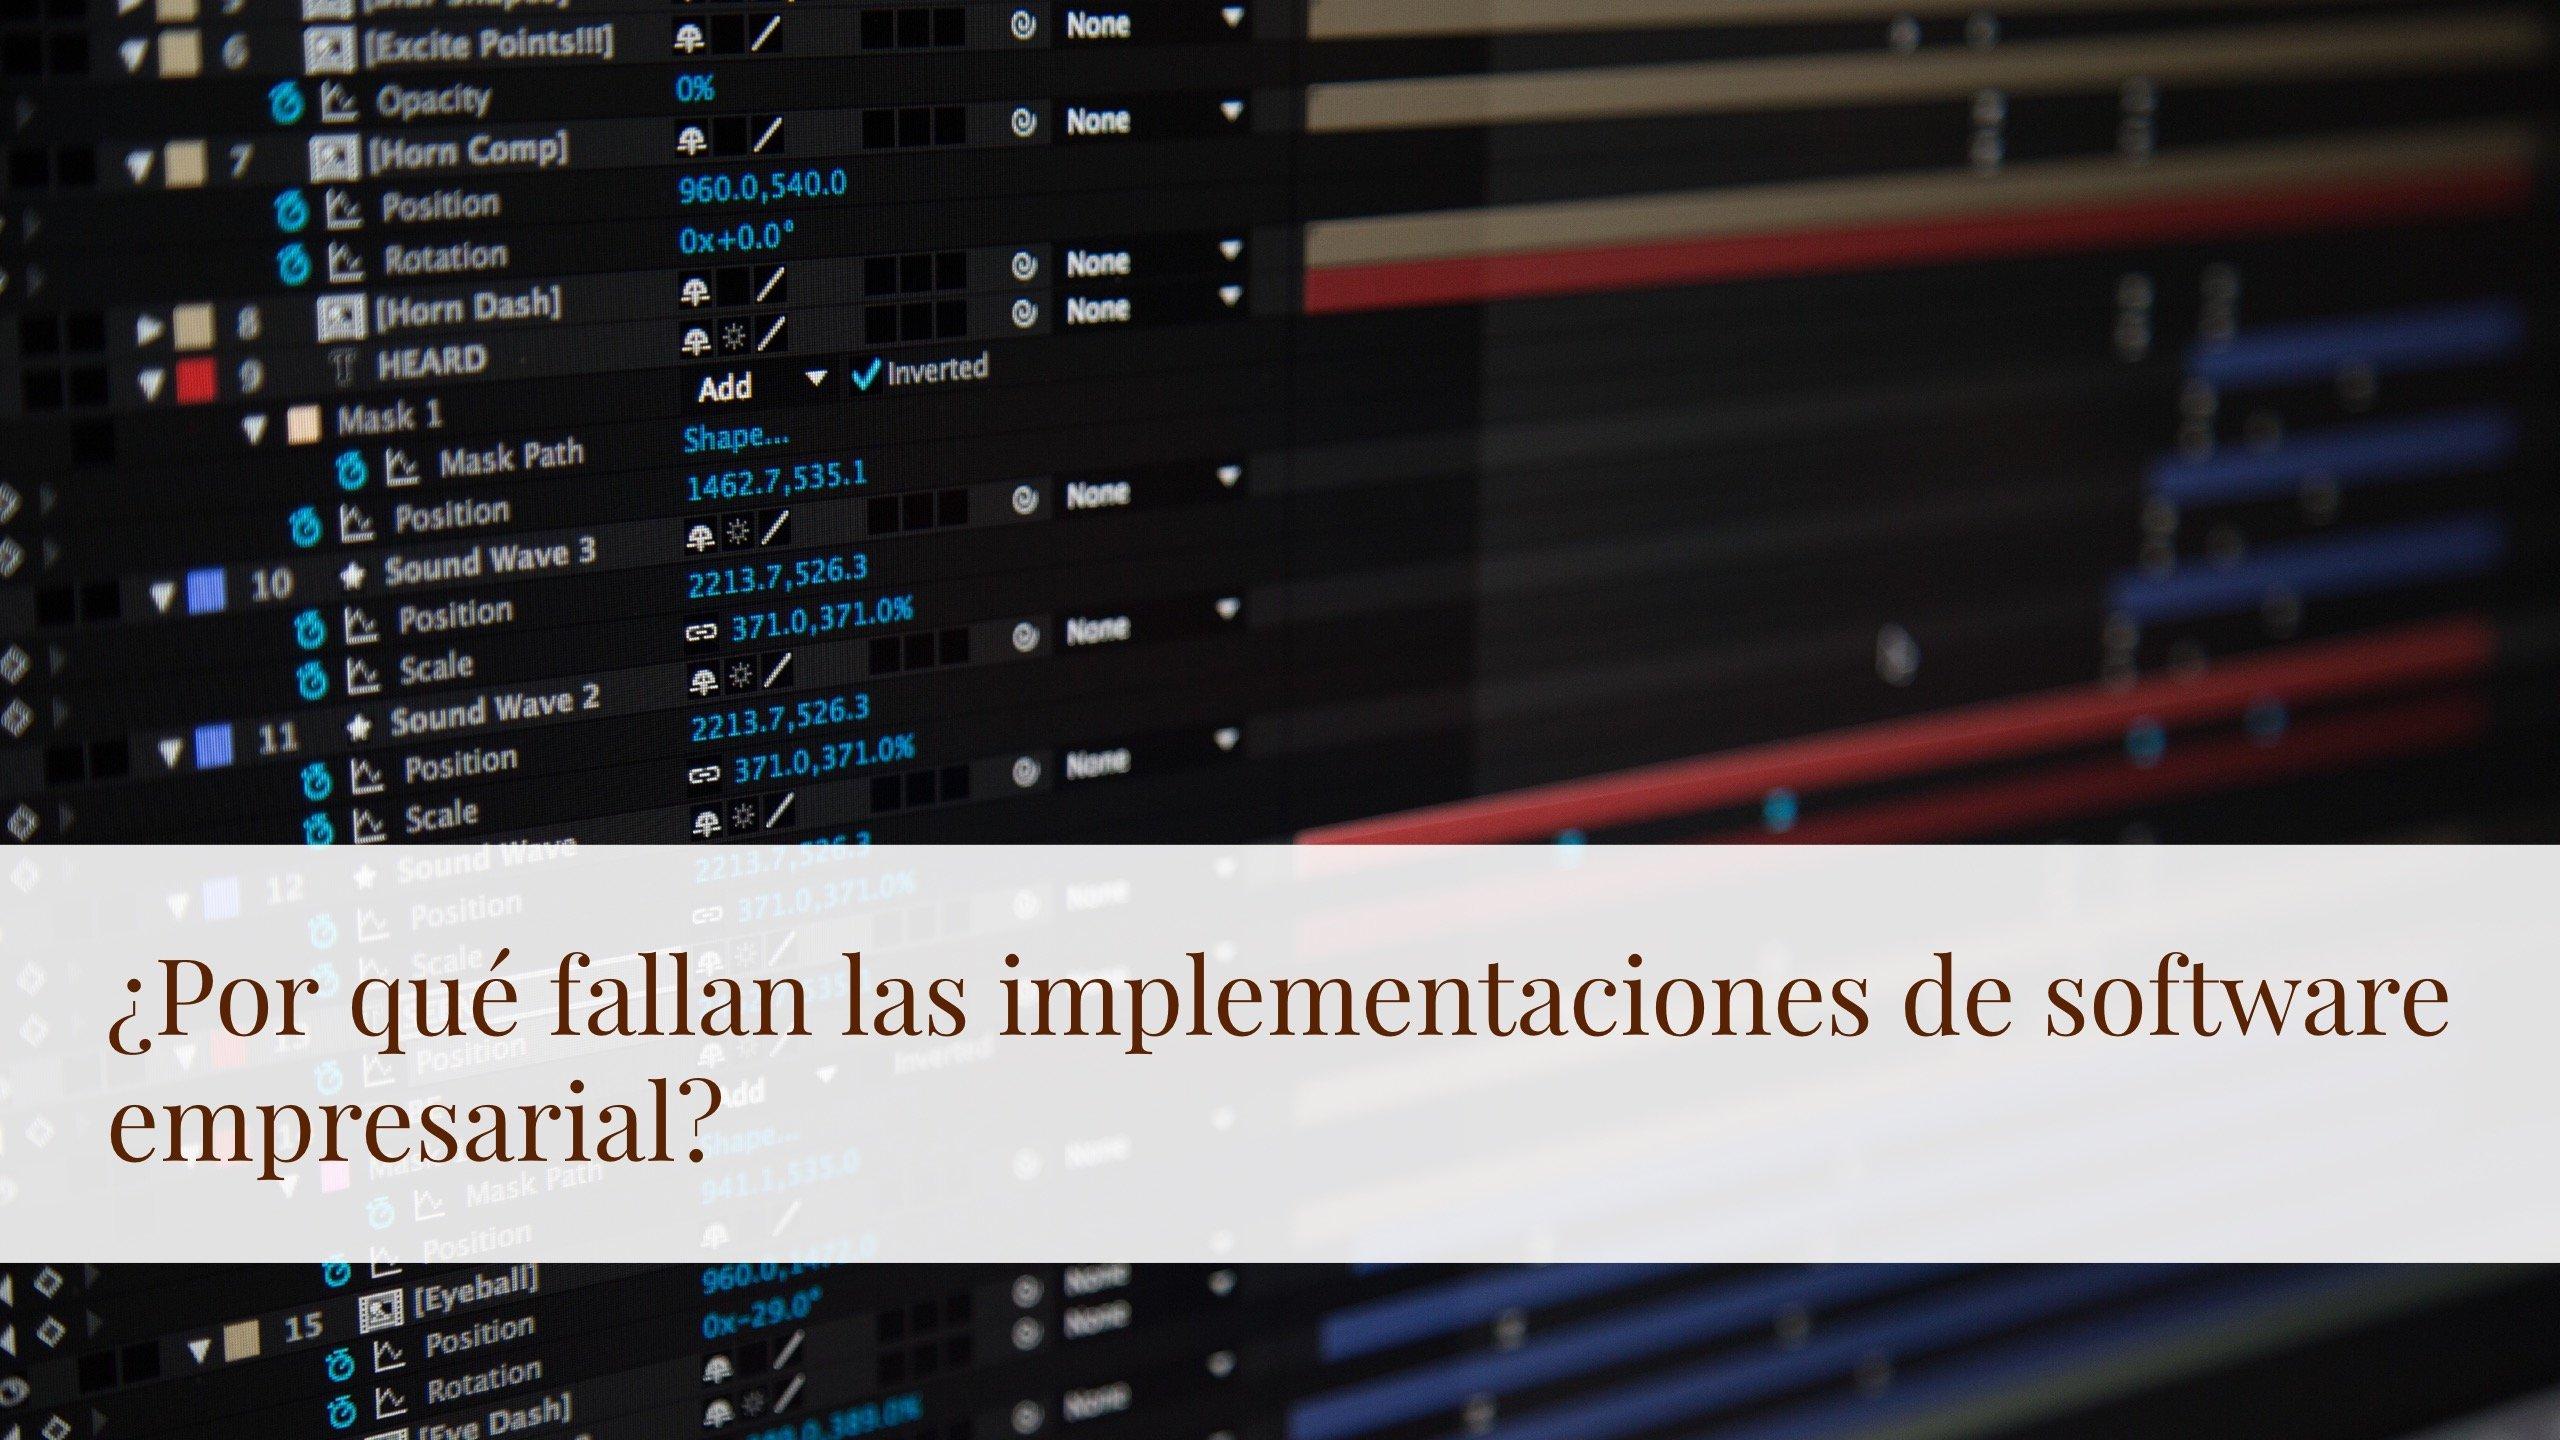 Implementación de software empresarial